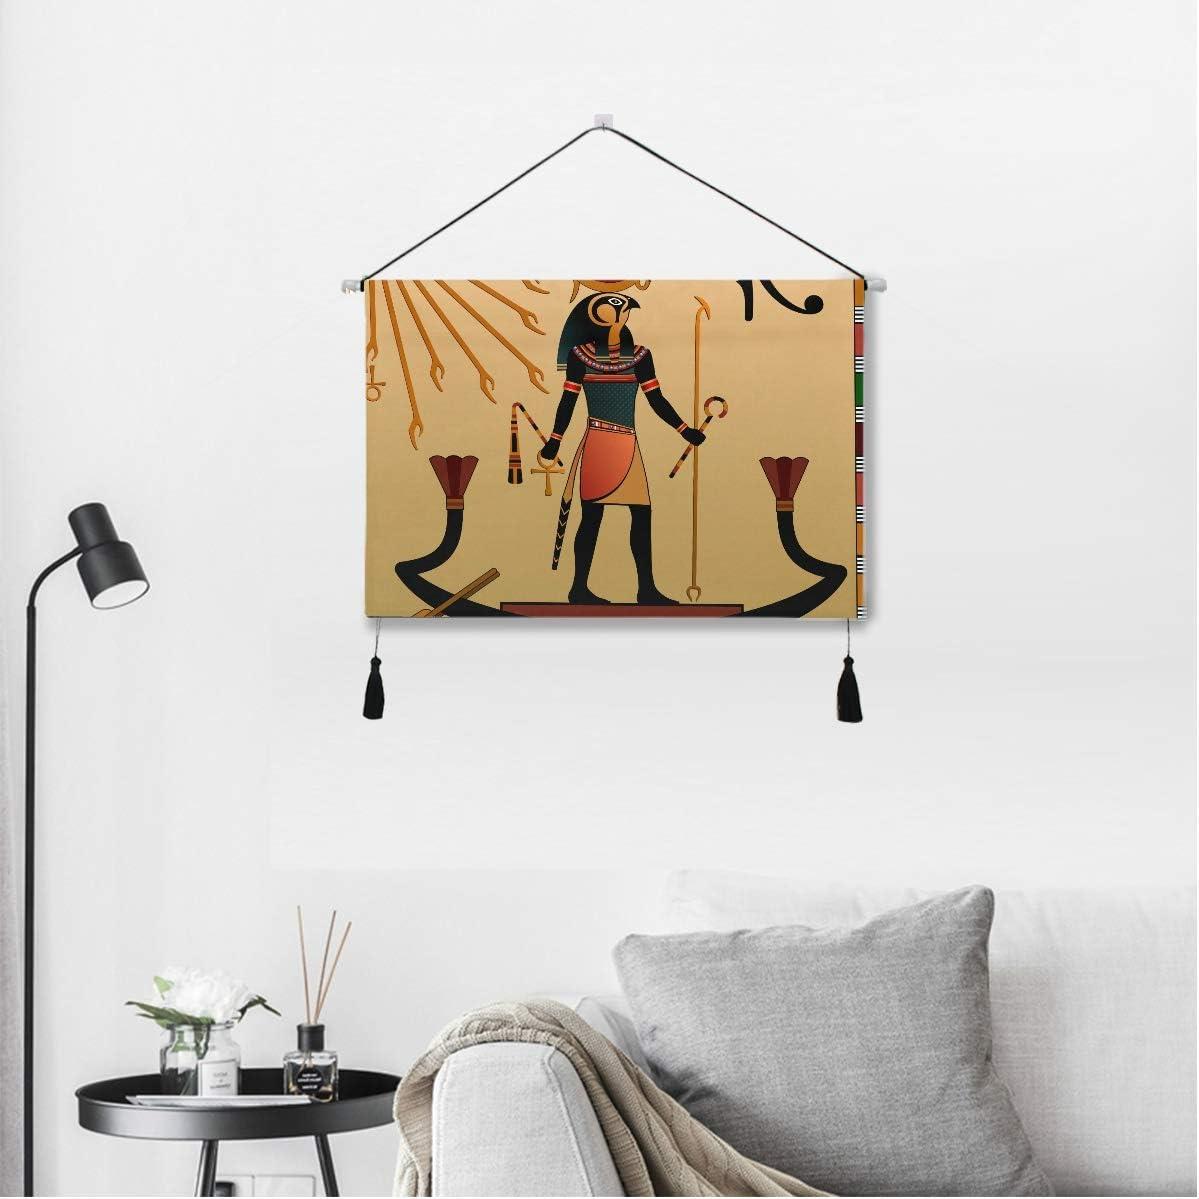 QiyI Room Decor Wall Art Ancient Ethnic Tribal Culture Egypt Totem Art African Anubis Sun God Wall Decor 17.5 X 24.5 Inches / 45cm X 62cm Wall Art for Apartment Dorm Room Backdrop Home Decor